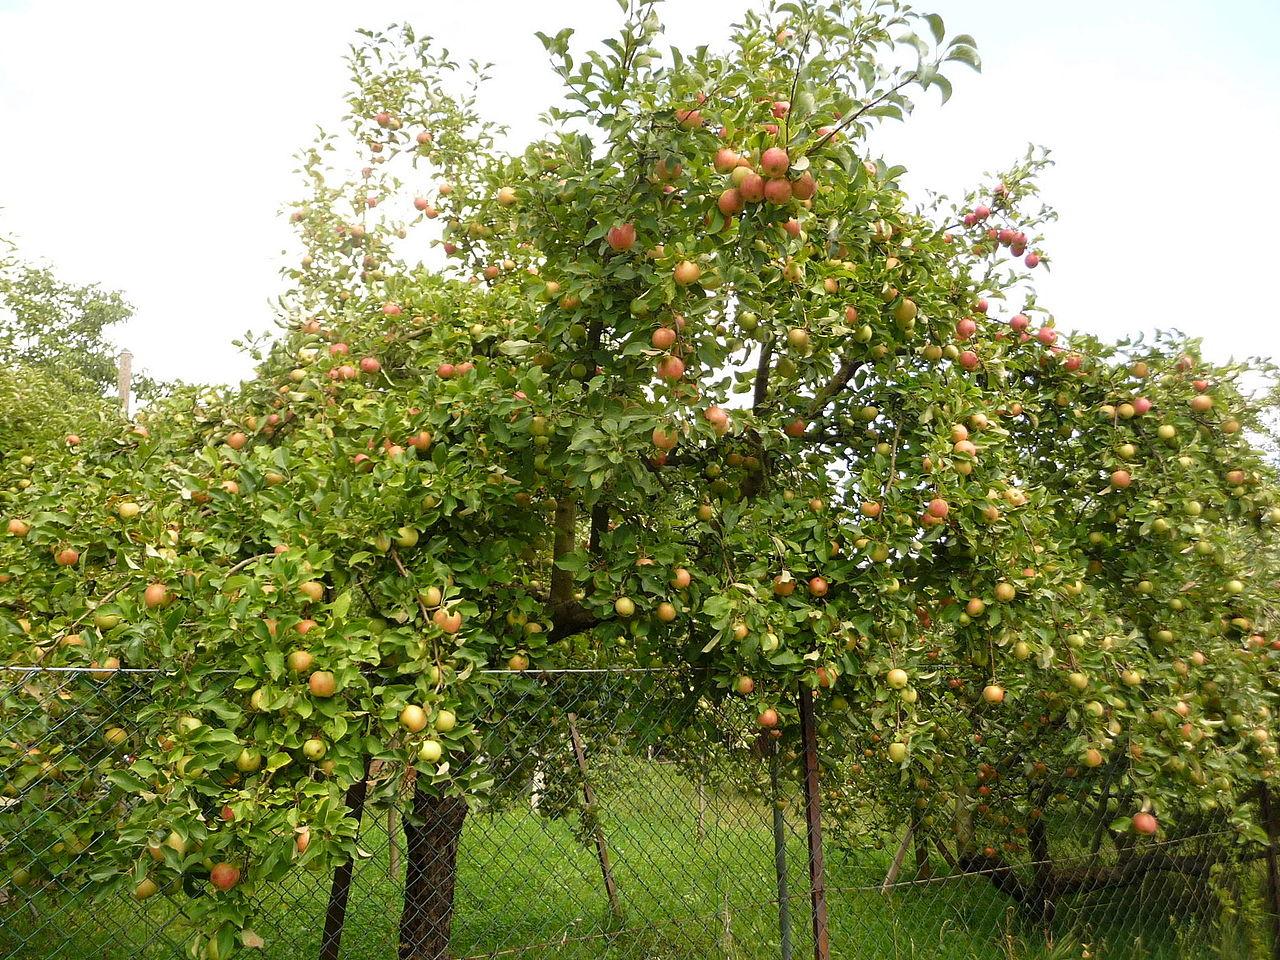 file apple tree fry t k 4 jpg wikimedia commons. Black Bedroom Furniture Sets. Home Design Ideas